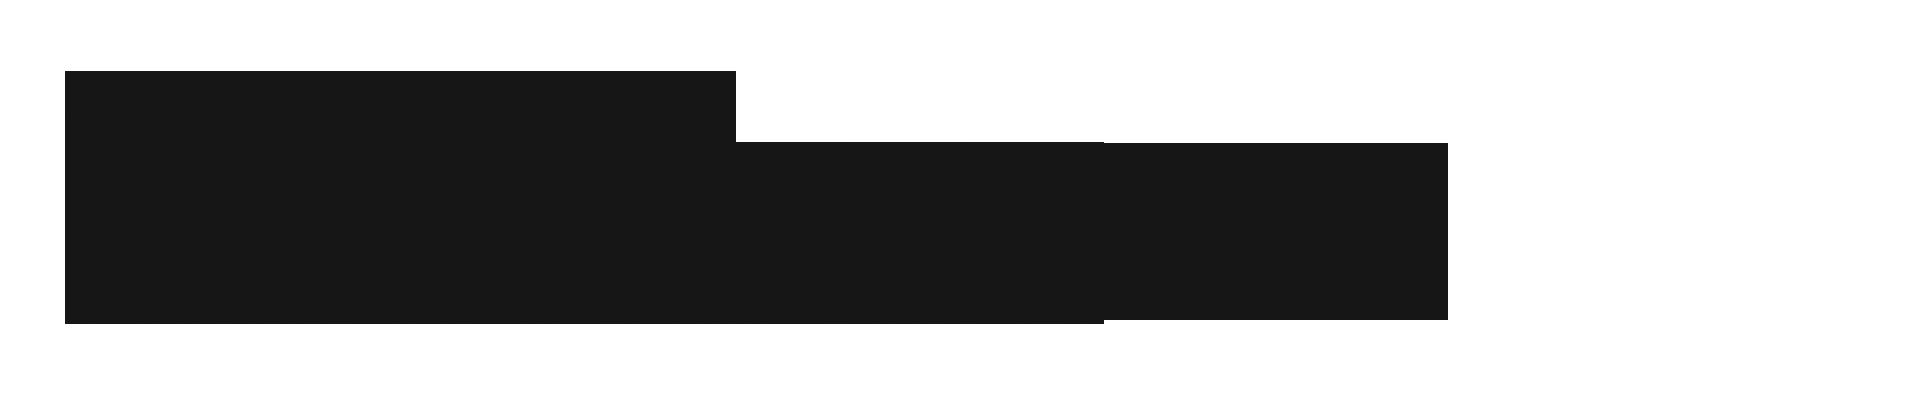 COC_fonts1_Pnknife